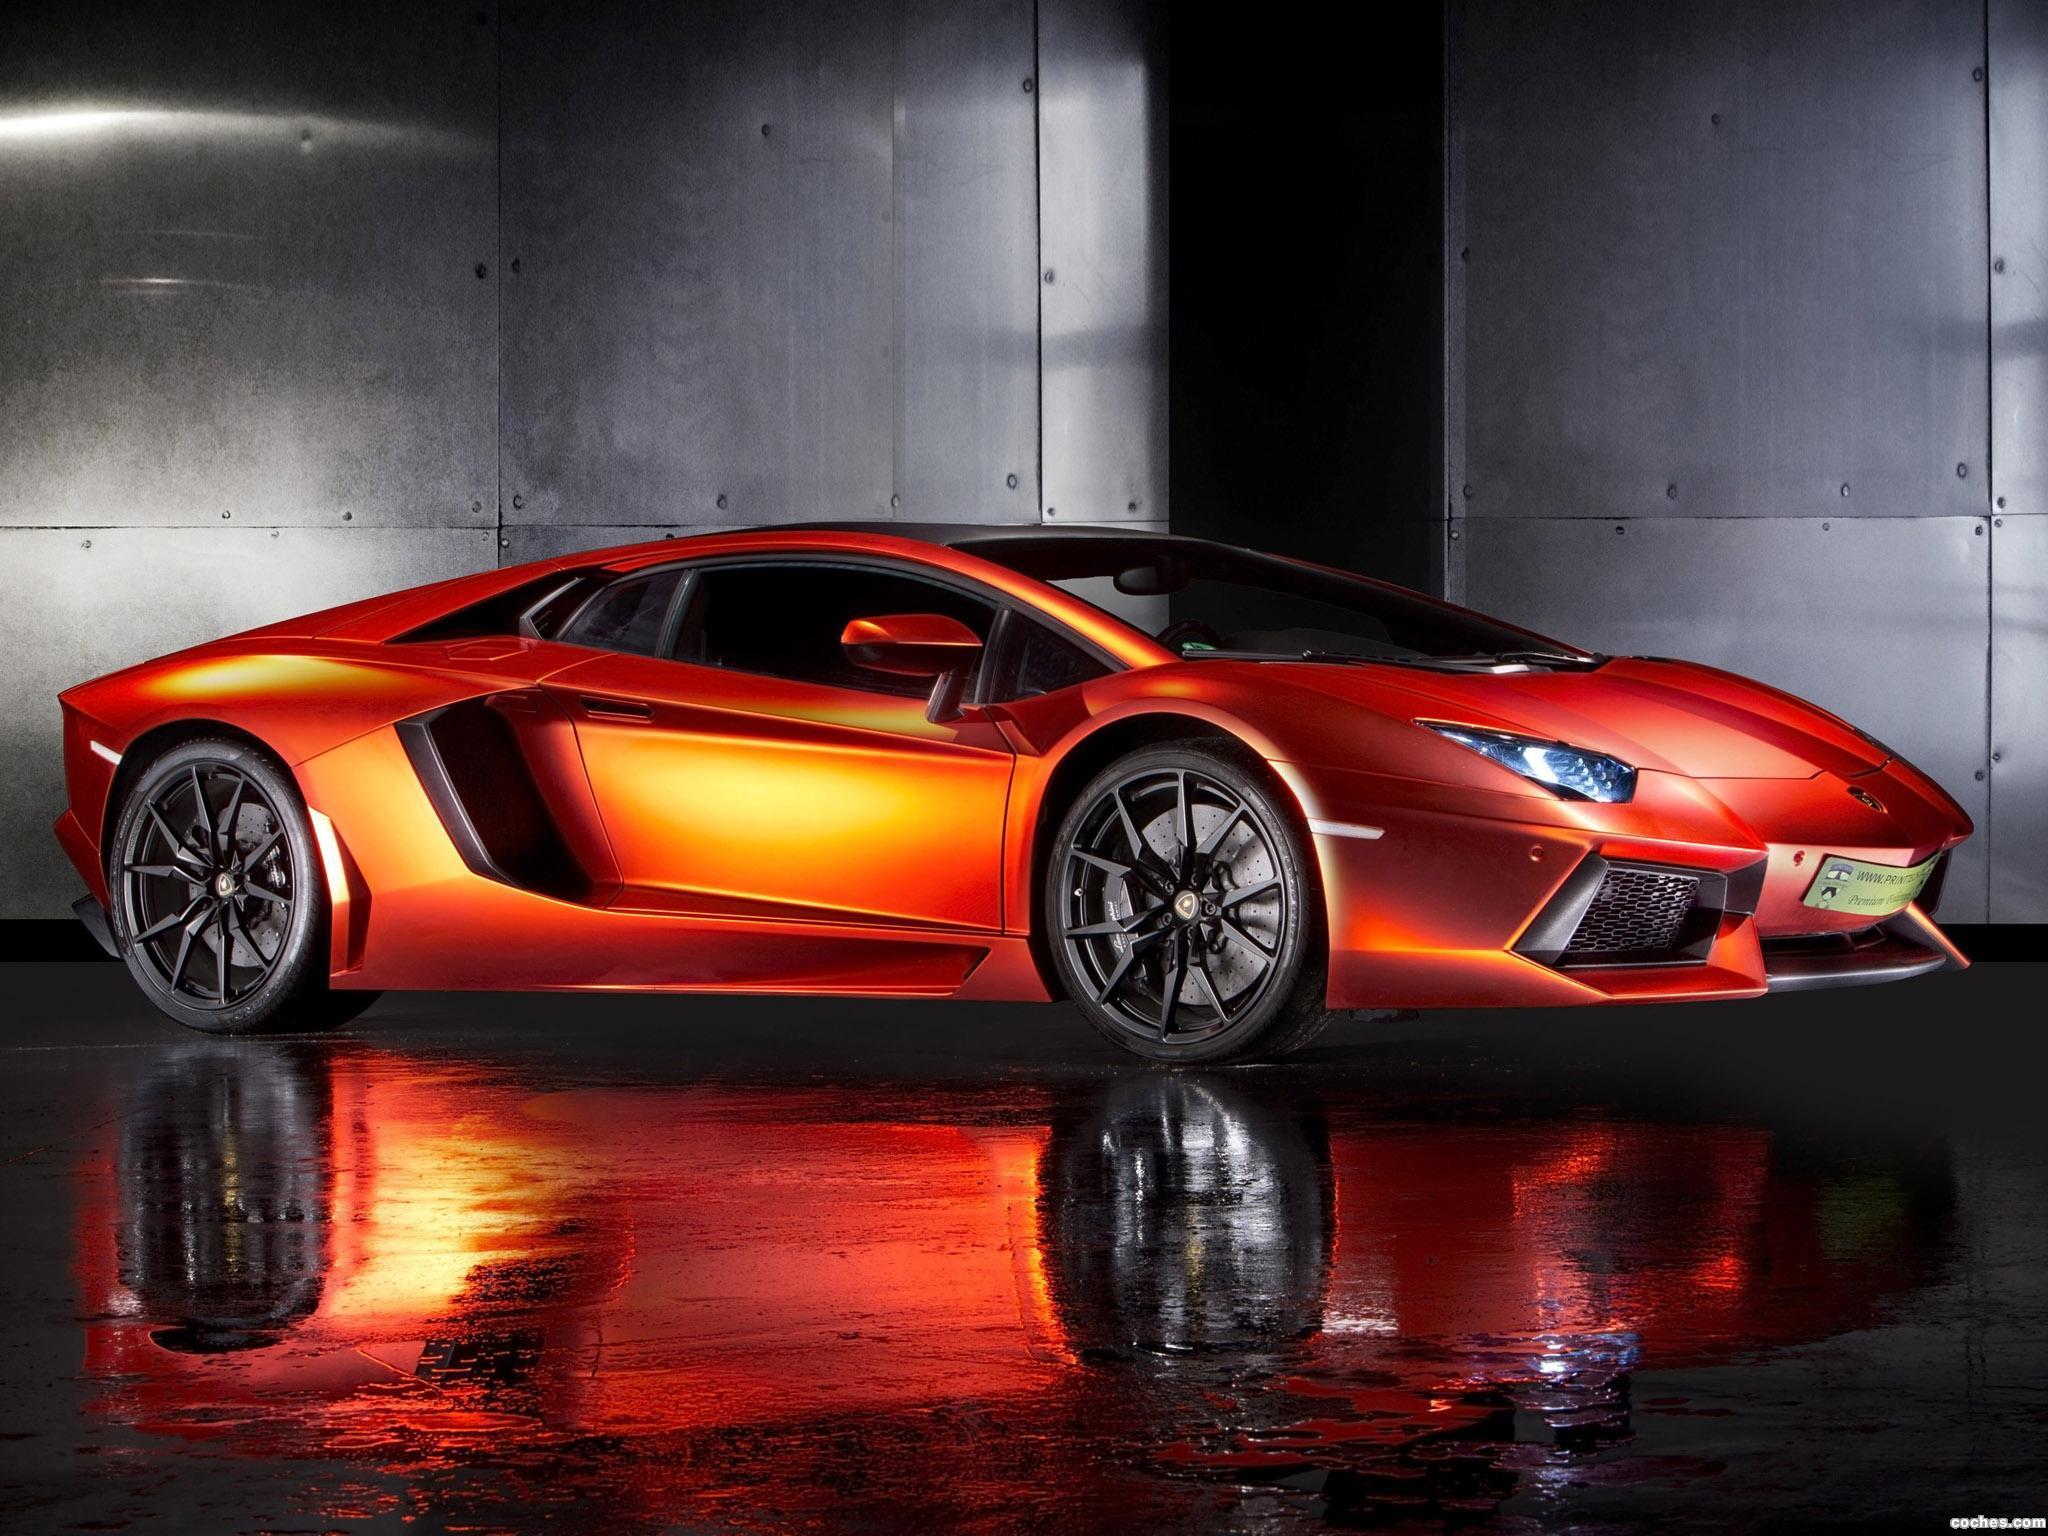 Foto 0 de Lamborghini Aventador Print Tech 2013